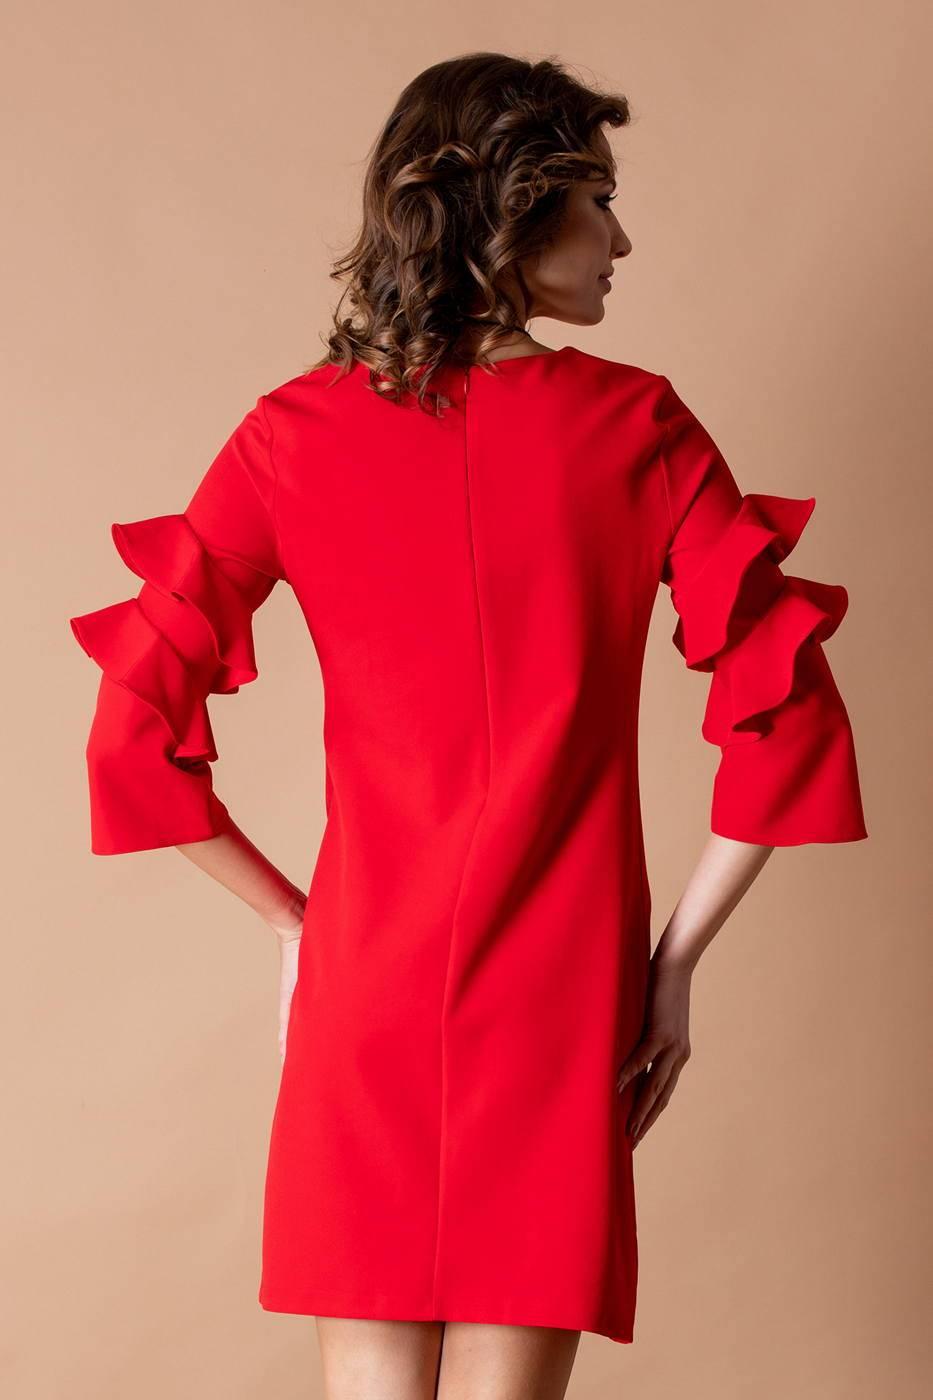 Hanna Κόκκινο Φόρεμα 1873